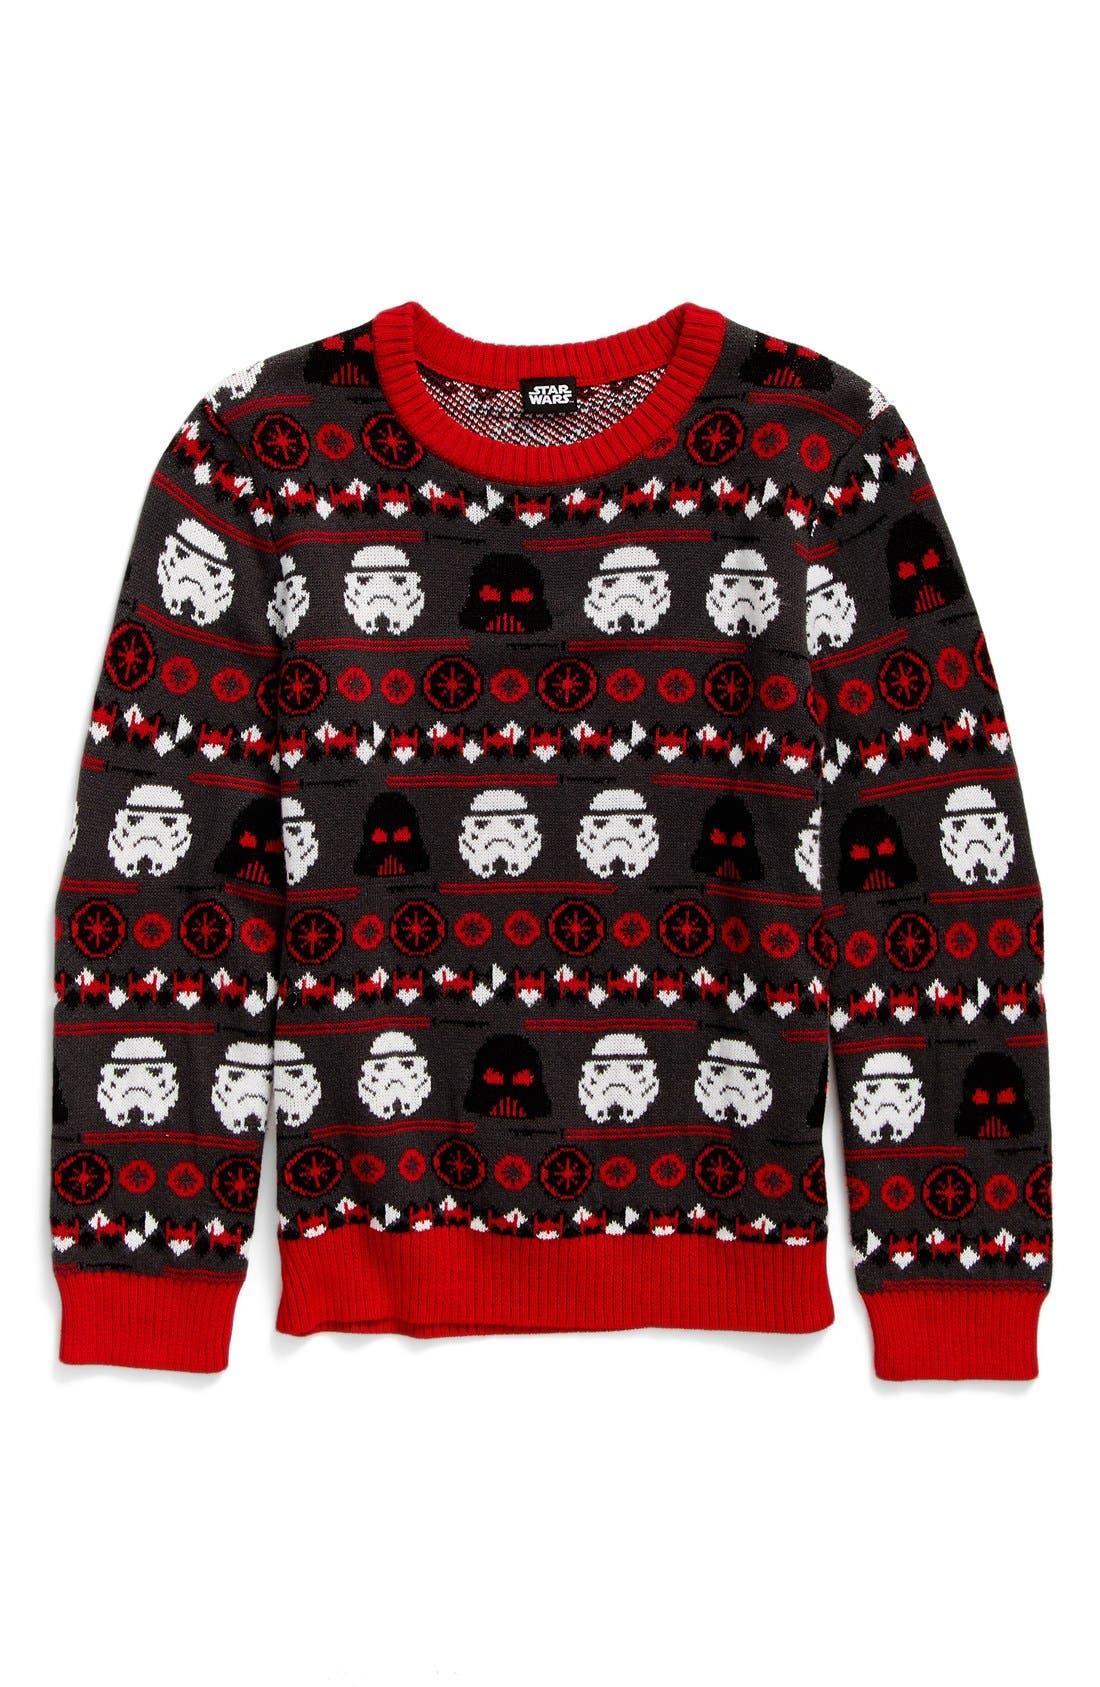 Alternate Image 1 Selected - Jem Holiday Wars Sweater (Big Boys)